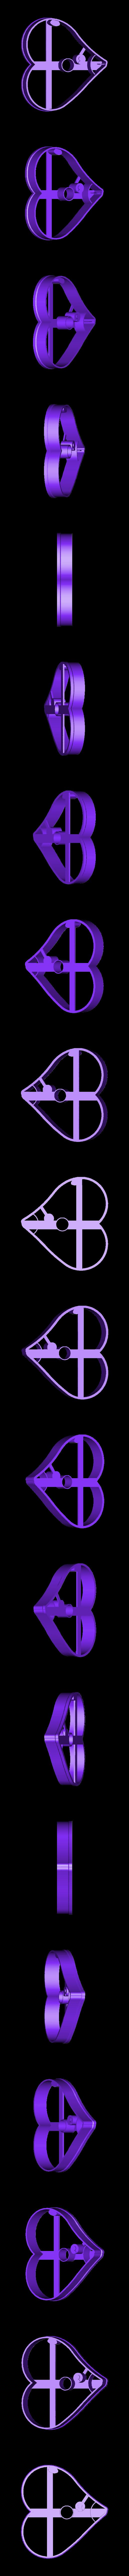 3D-01056 - LUVDISC COOKIE CUTTER.stl Descargar archivo STL Luvdisc pokemon cookie cutter • Diseño para impresión en 3D, 3DPrintersaur